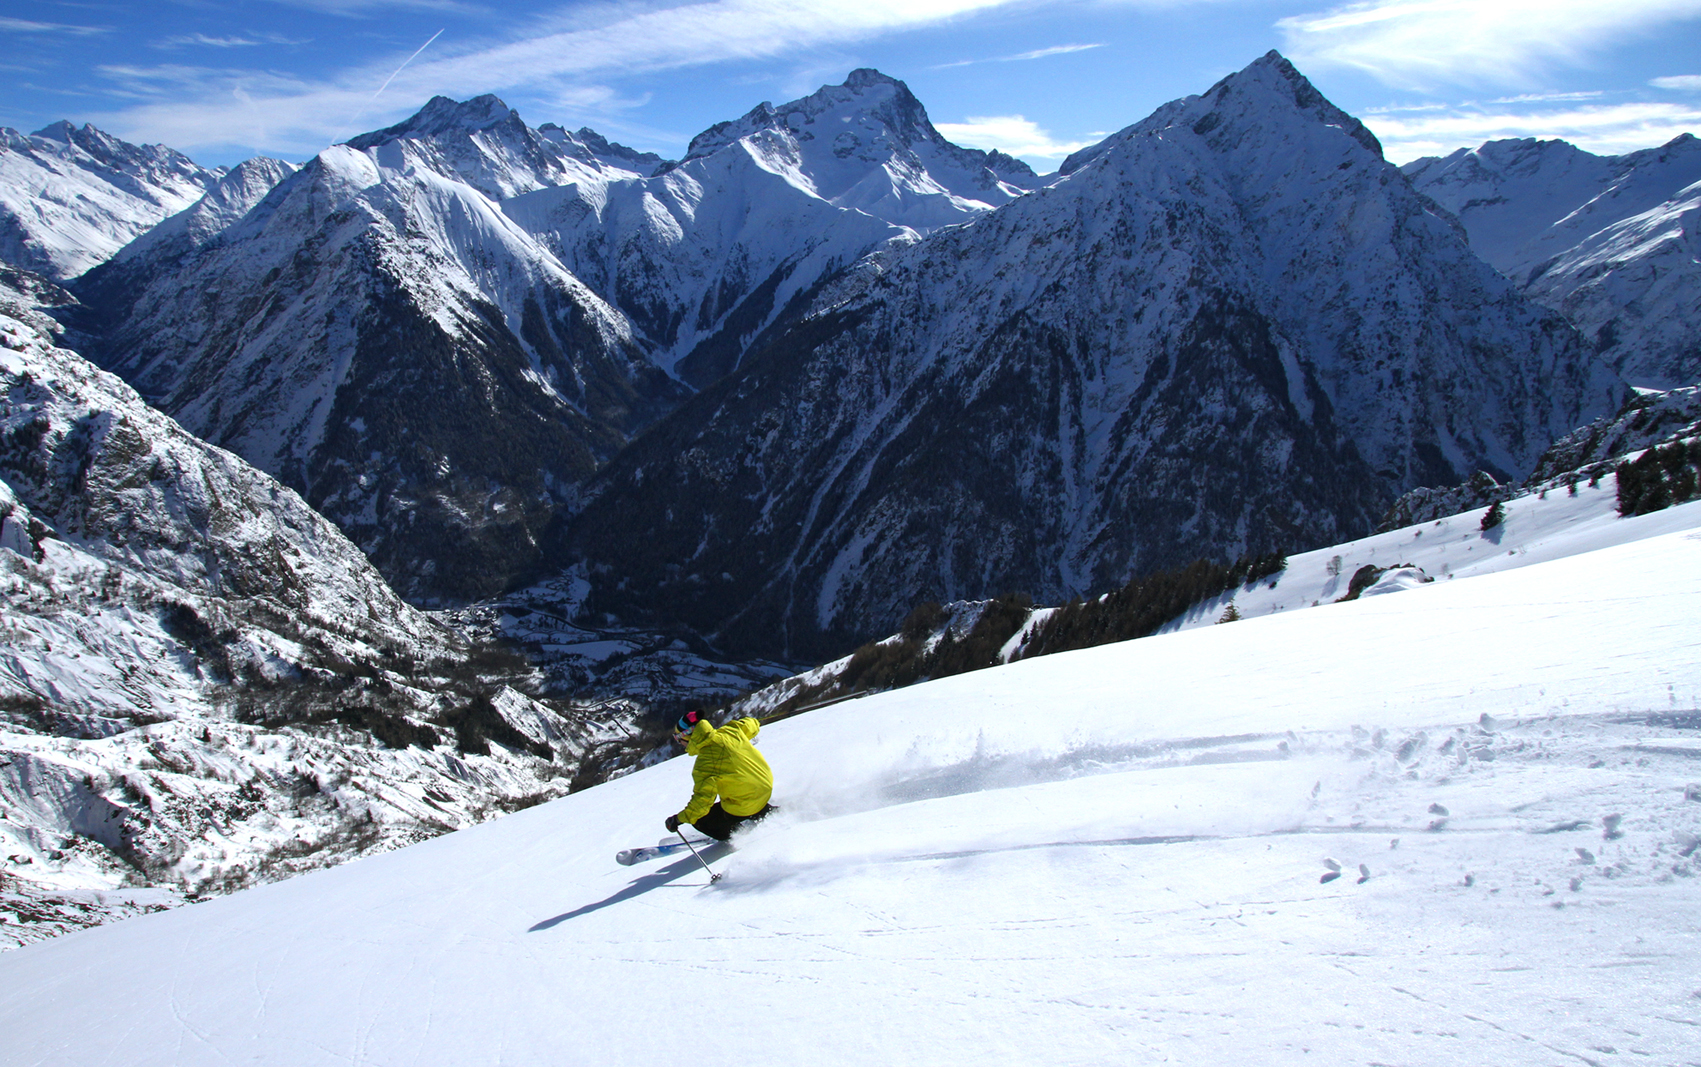 Les 2 Alpes © OT Les 2 Alpes – Bruno Longo